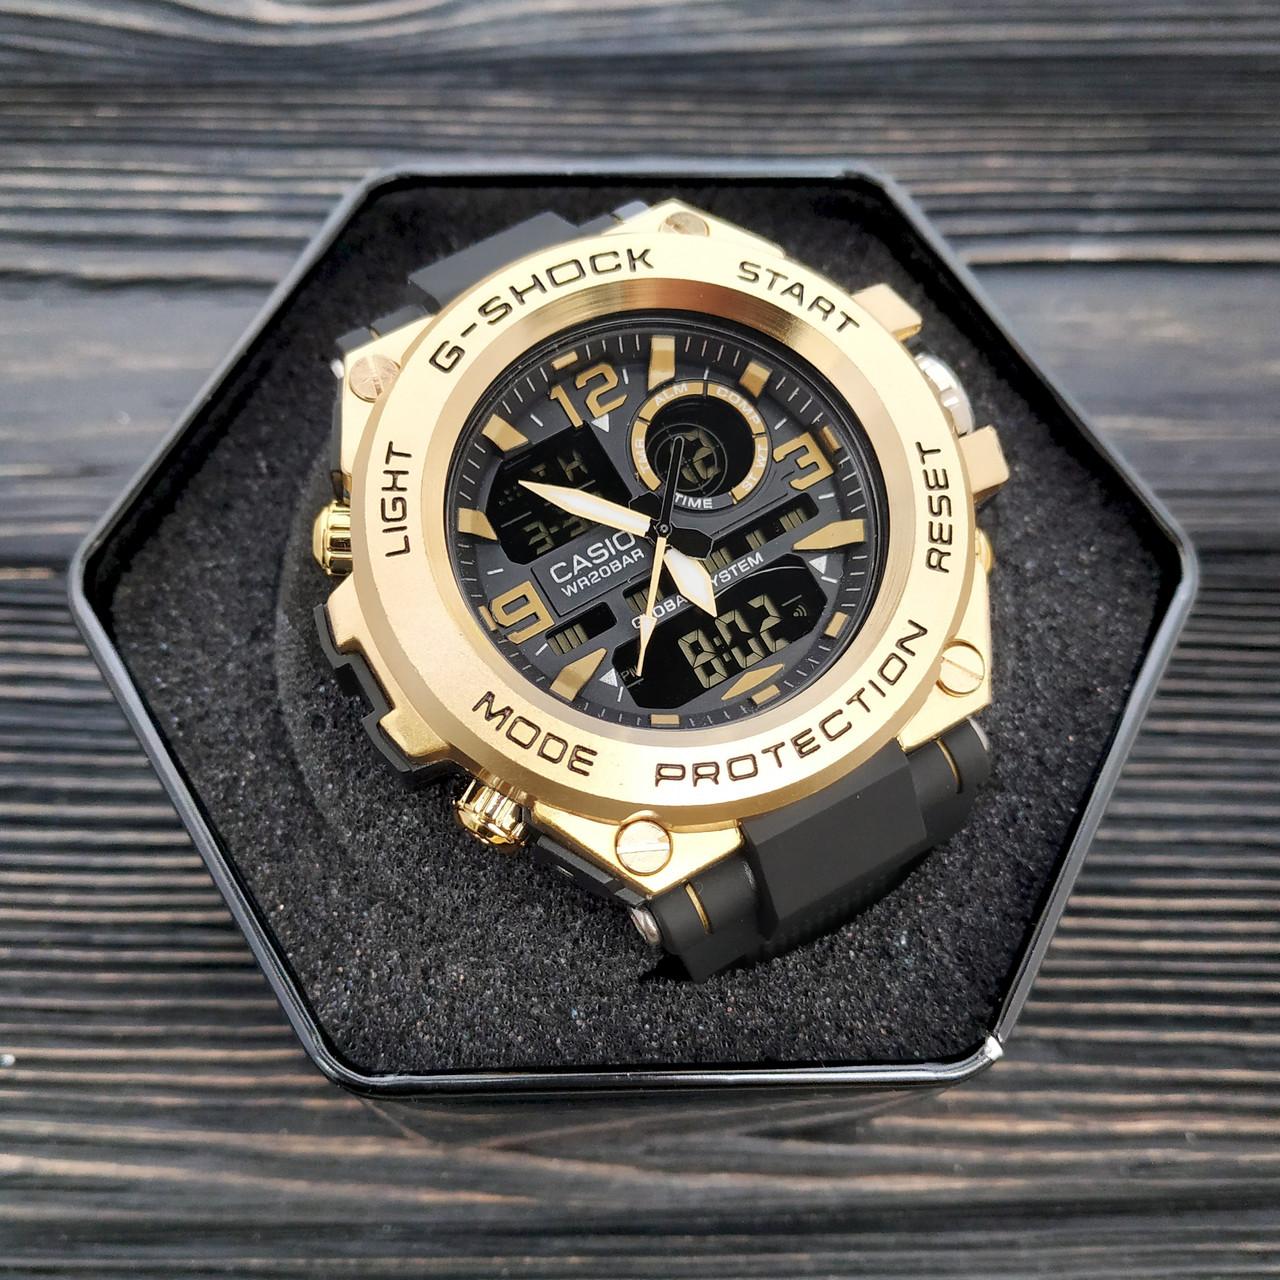 Мужские наручные часы Casio G-Shock GLG-1000 Black-Gold